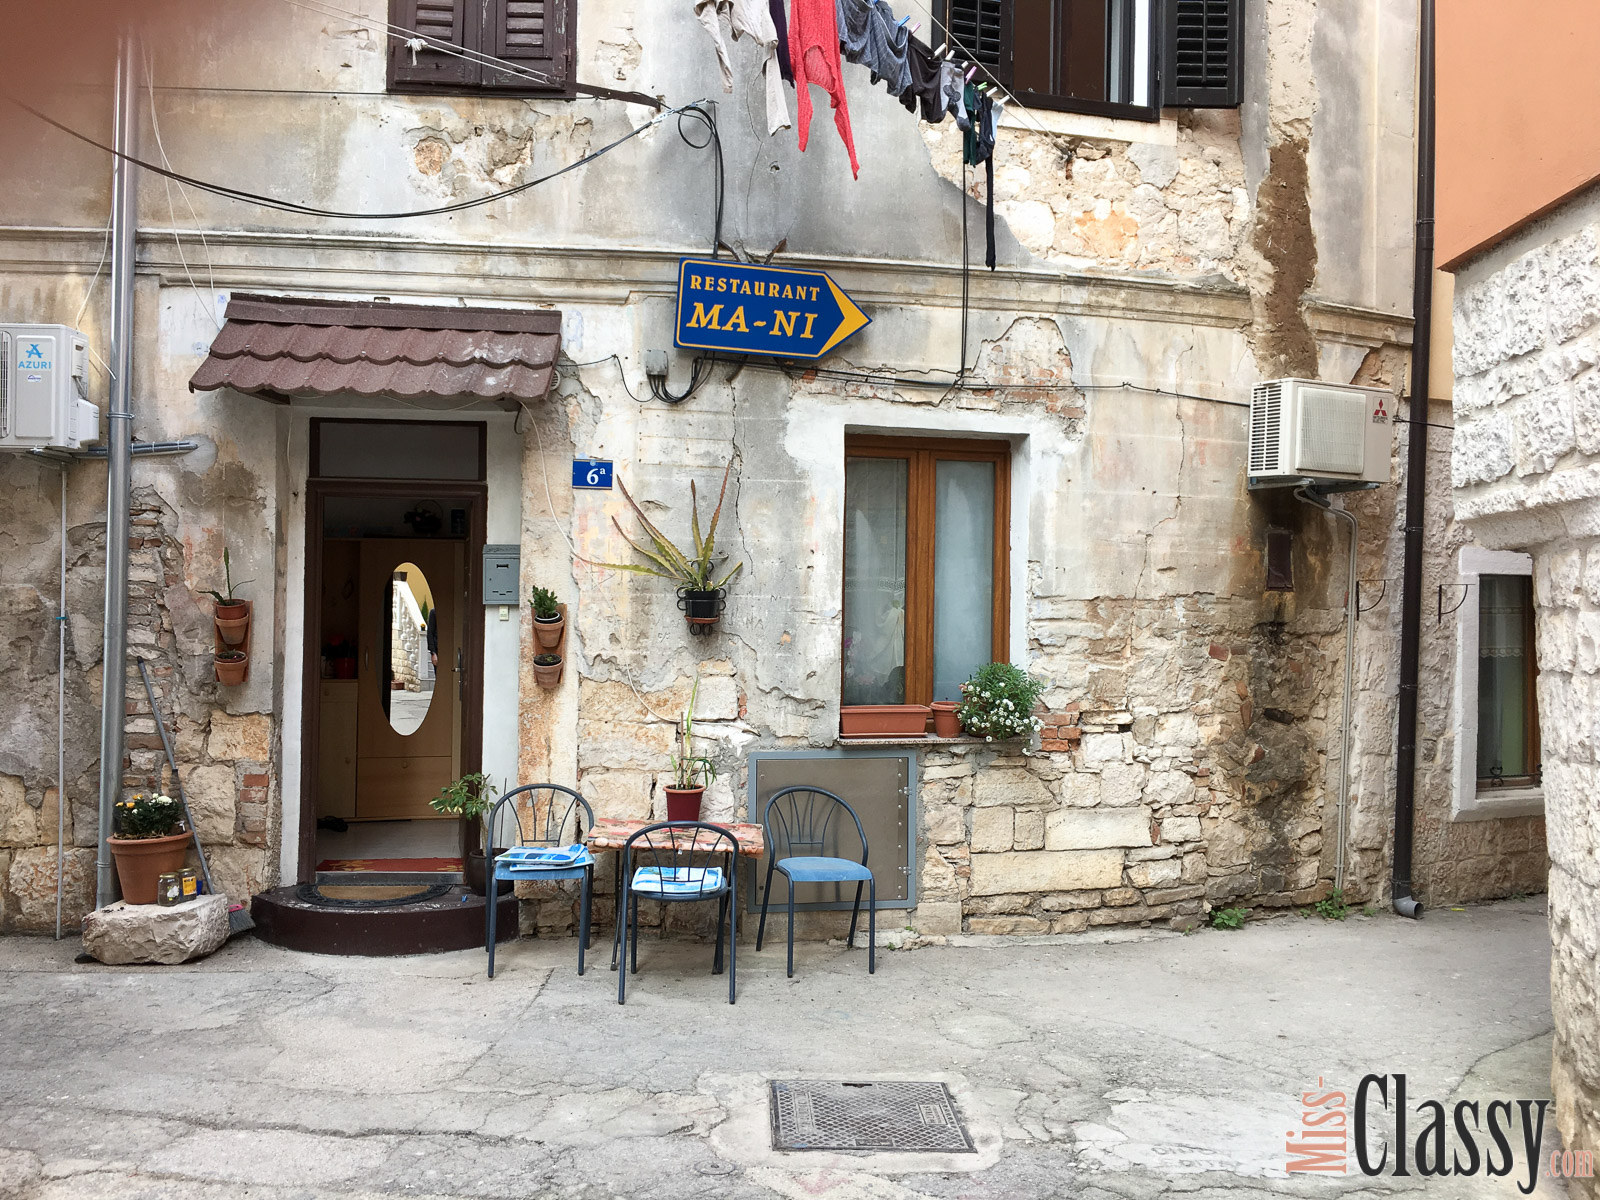 TRAVEL Umag, Miss Classy, miss-classy.com, Lifestyleblog, Lifestyleblogger, Lifestyleblog Graz, Travelblog, Travelblogger, Graz, Steiermark, Österreich, classy, beclassy, Reise, Travel, Wanderlust, Wayfarer, Umag, Kroatien, Istrien, Meer, Wochenendtrip